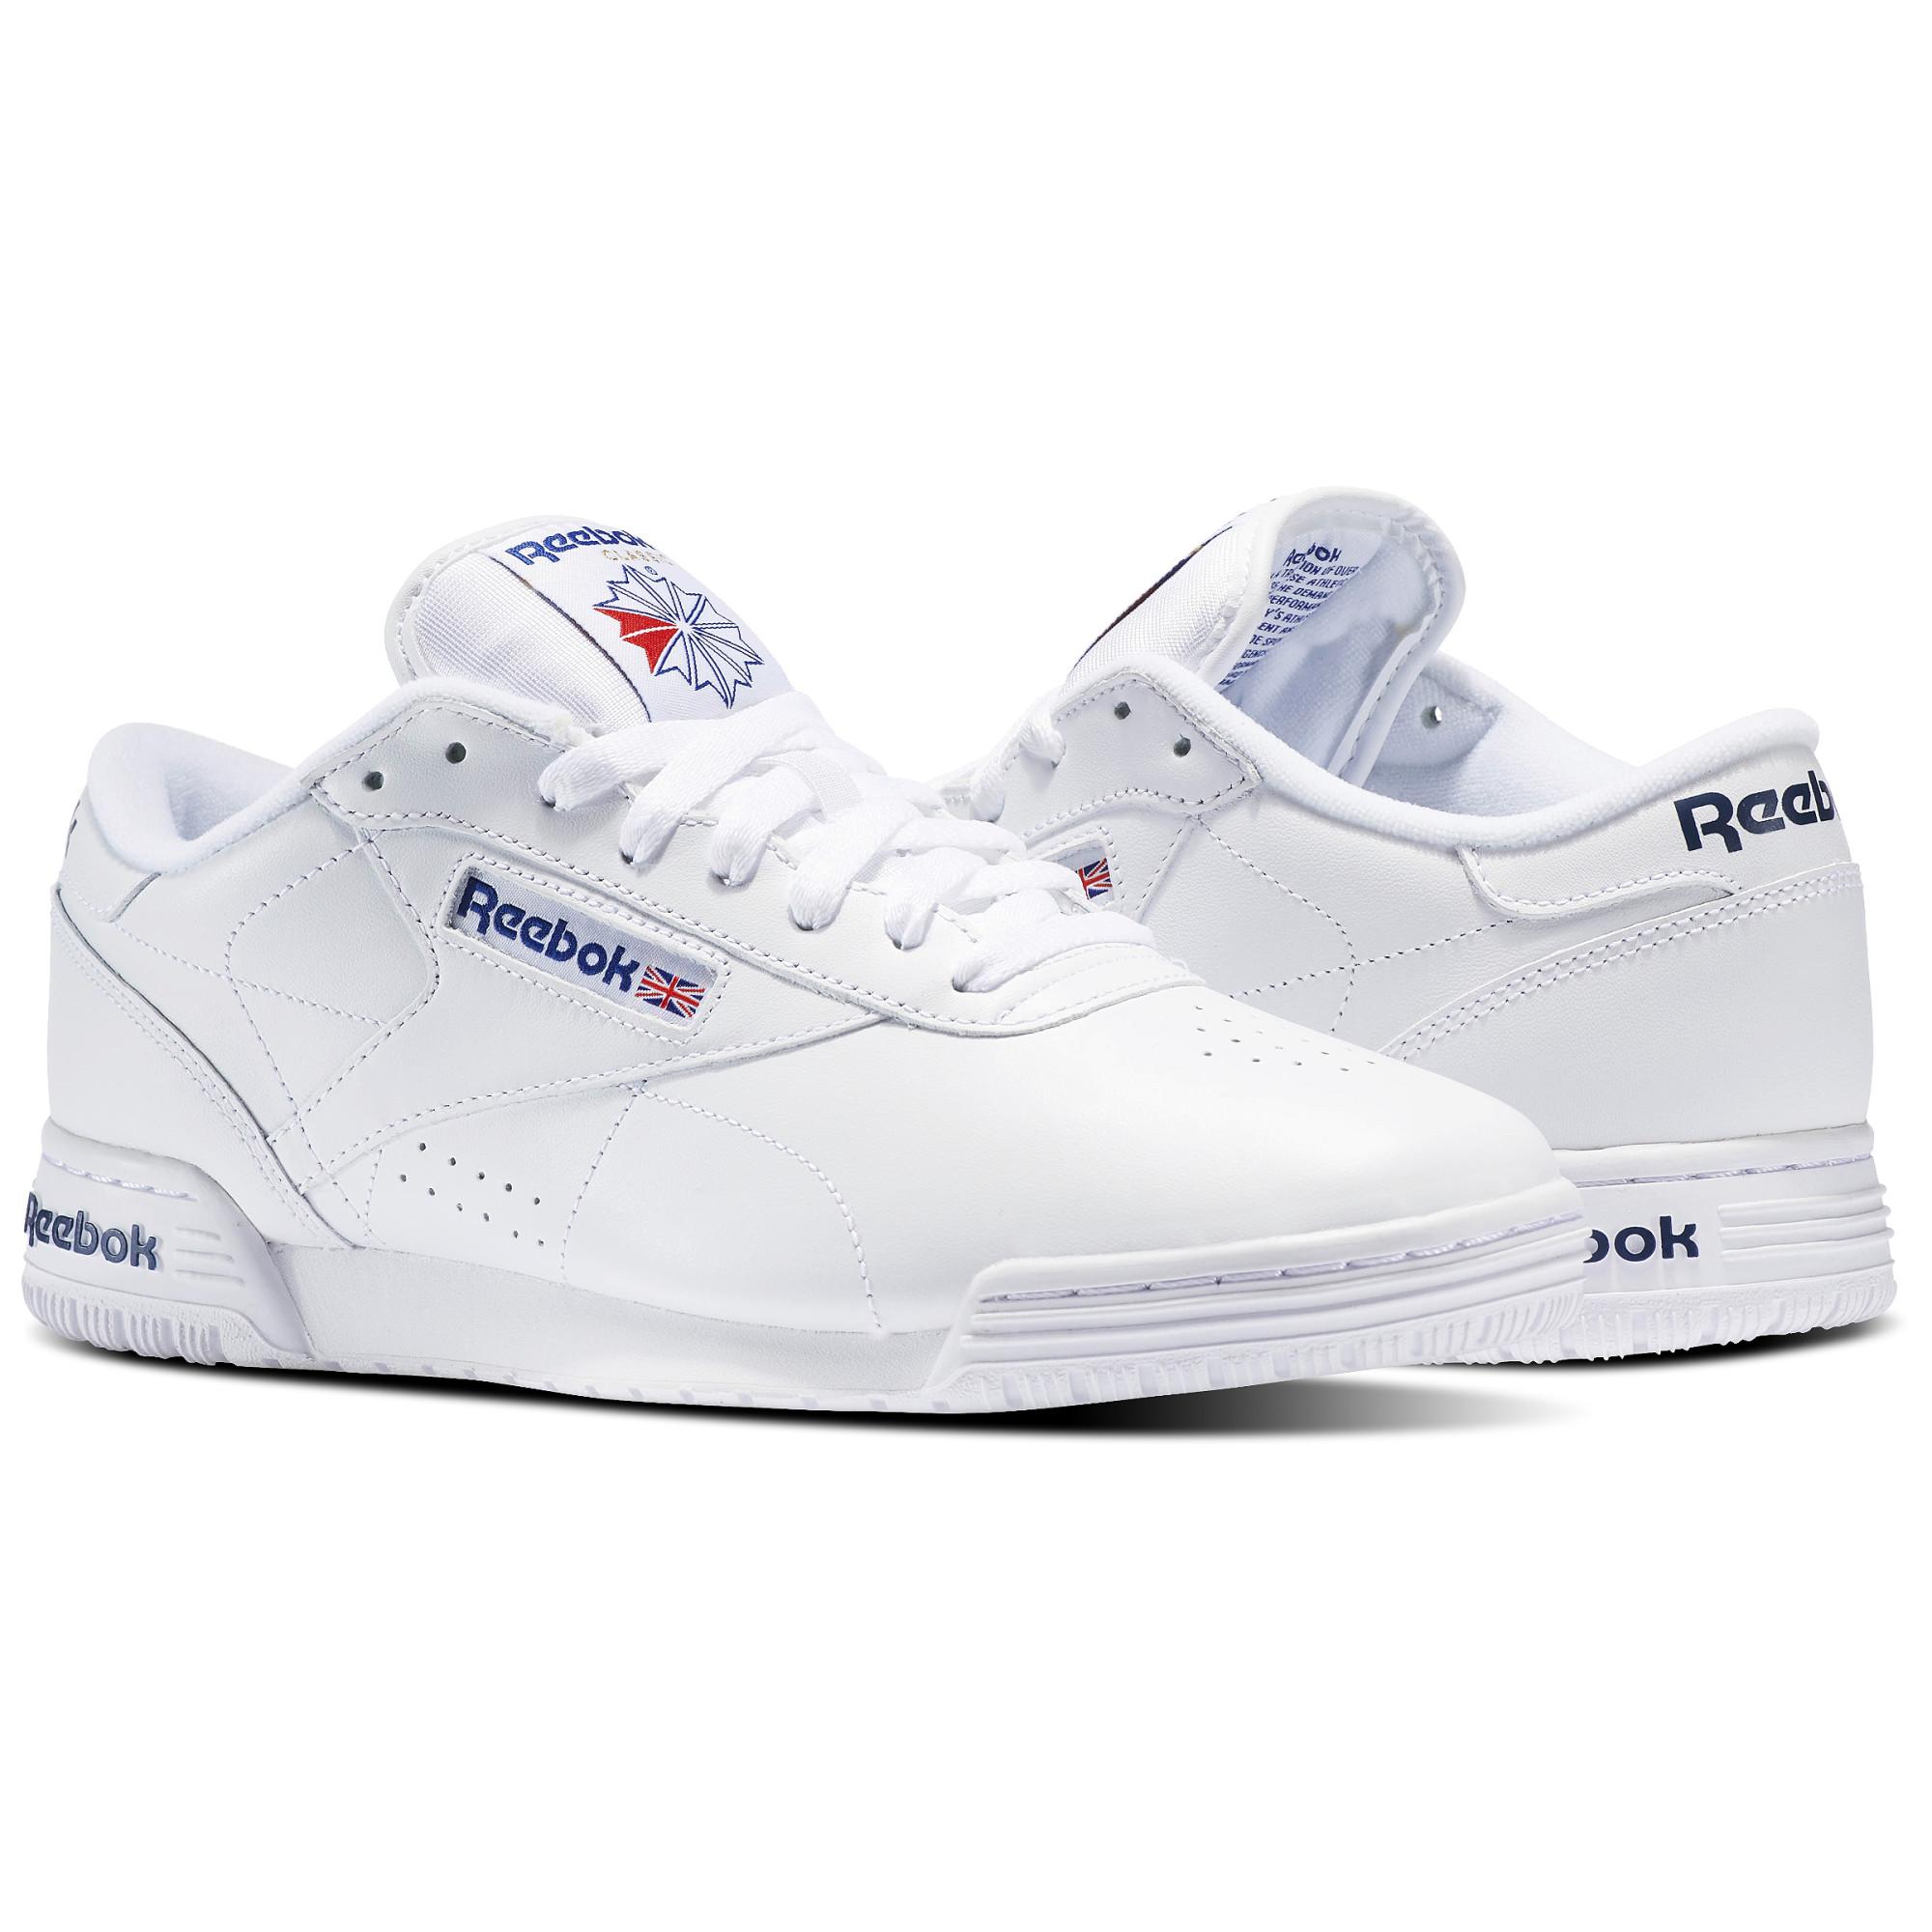 fc3fa0718213 Reebok Men s Classics Exofit Lo Shoes (White) - Slickdeals.net